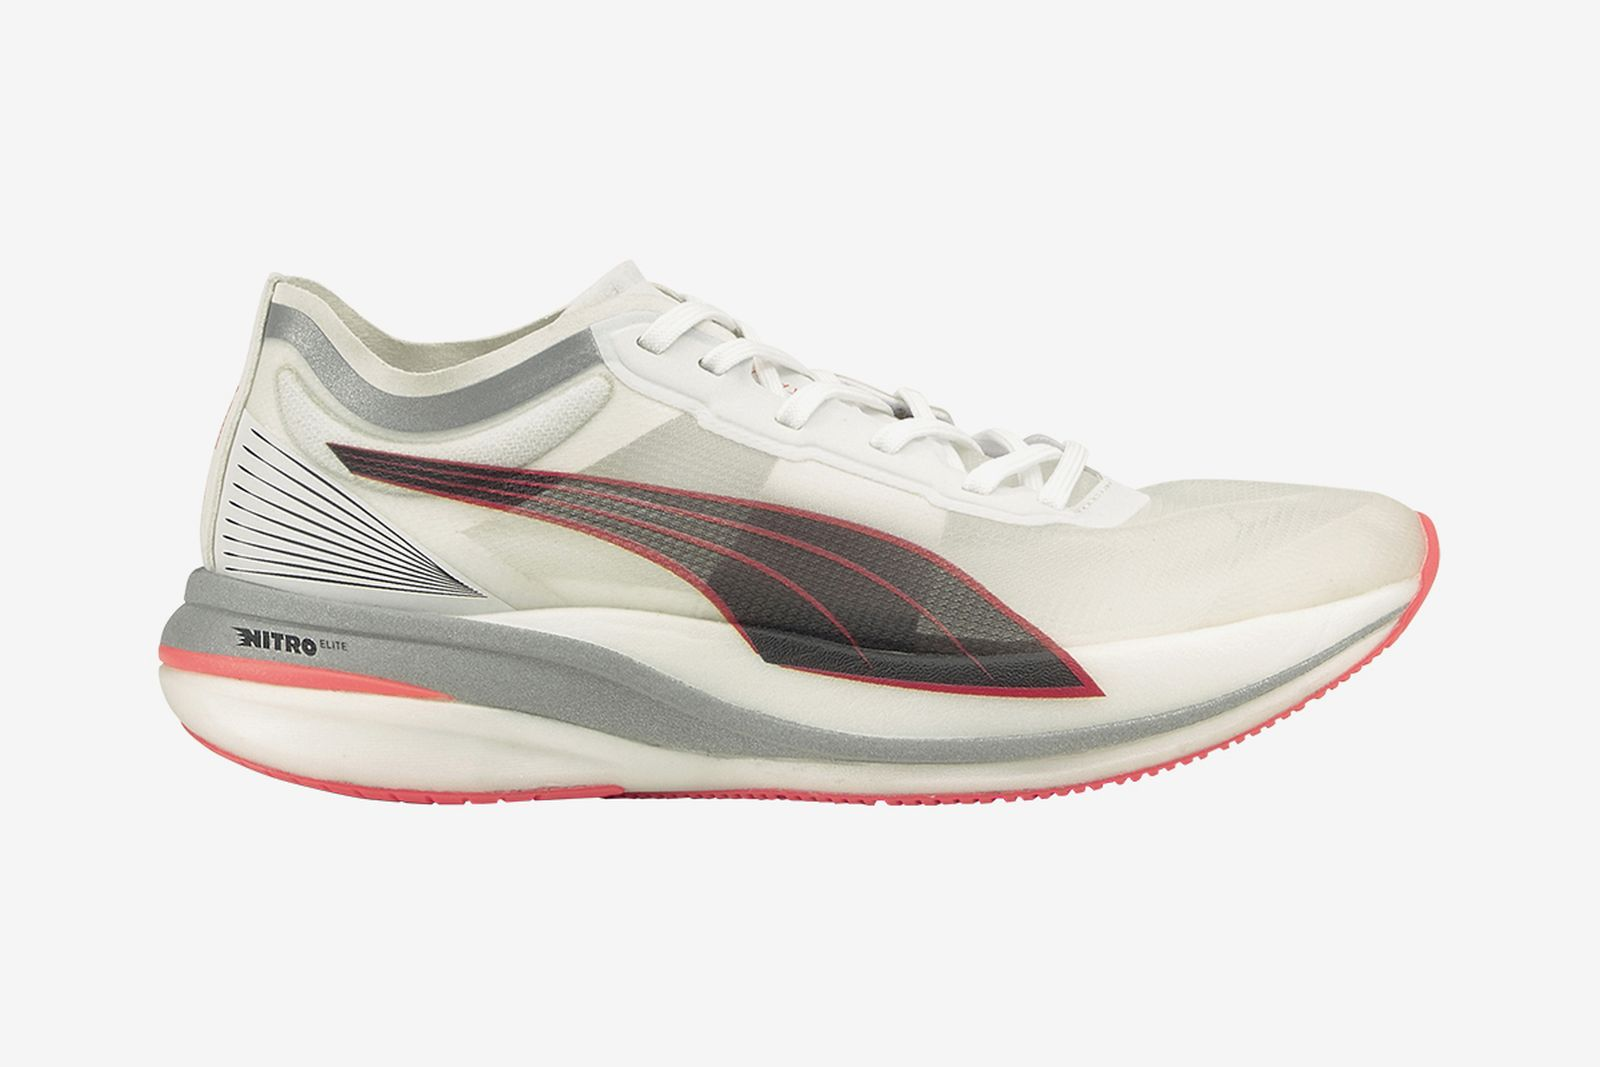 sneaker-news-3-02-25-2021-04